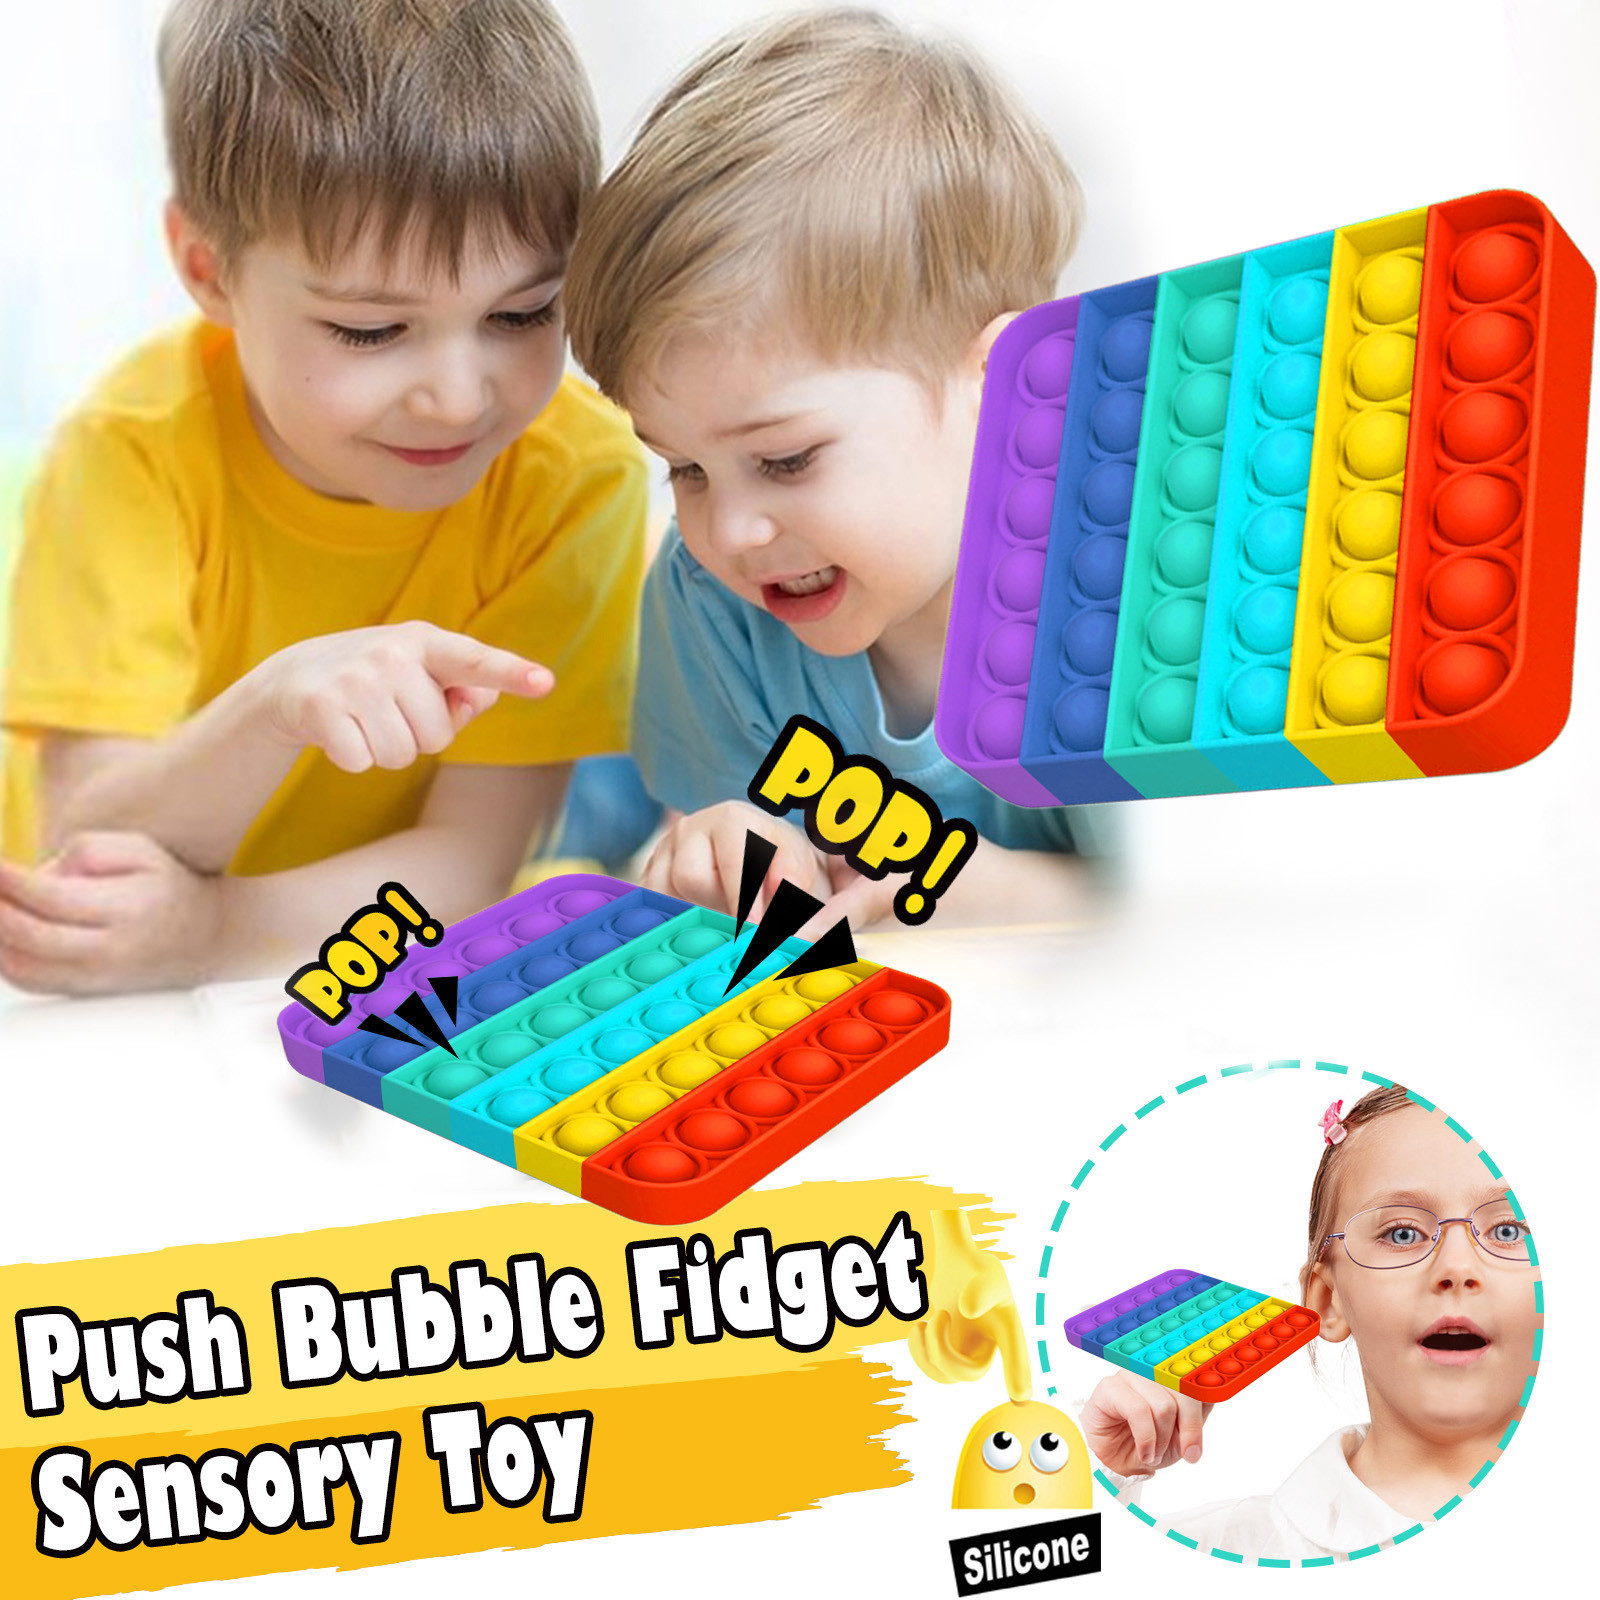 Stress-Toys Fidget Funny Gift Push Bubble Pops Reliever Special Children 1pc Autism Juguetes img4